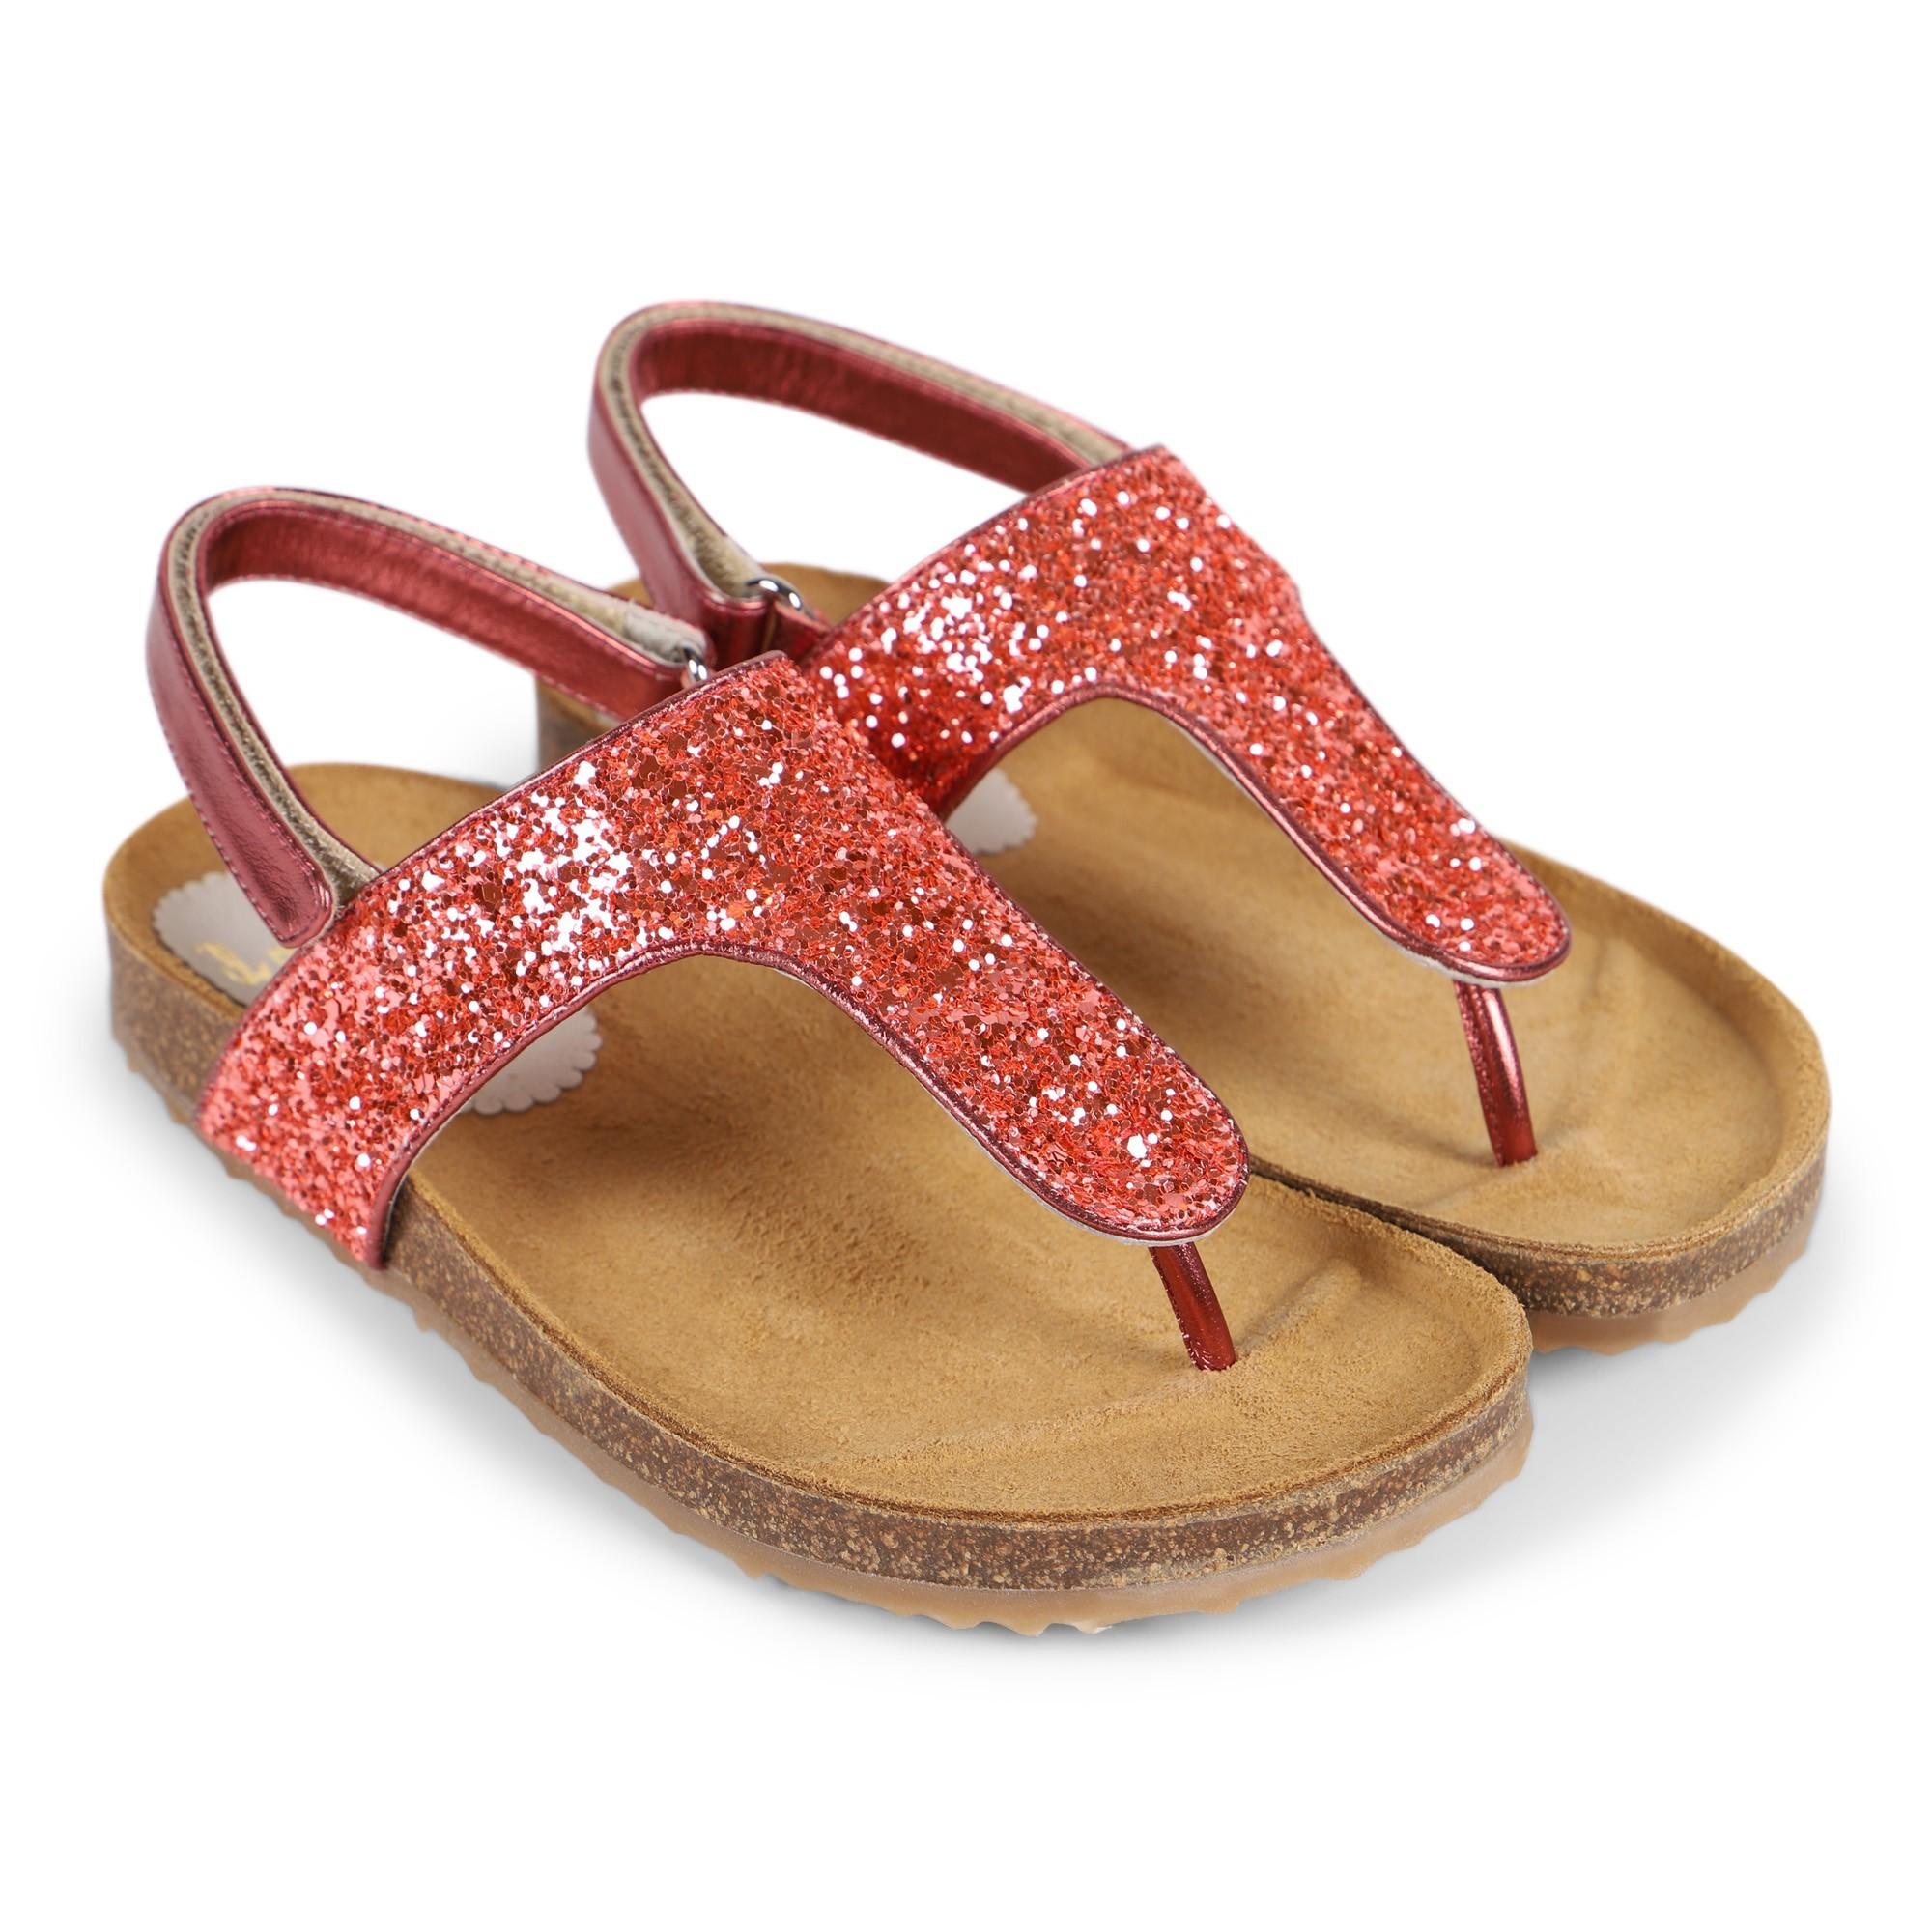 IL GUFO Girls Glitter Sandals in Pink